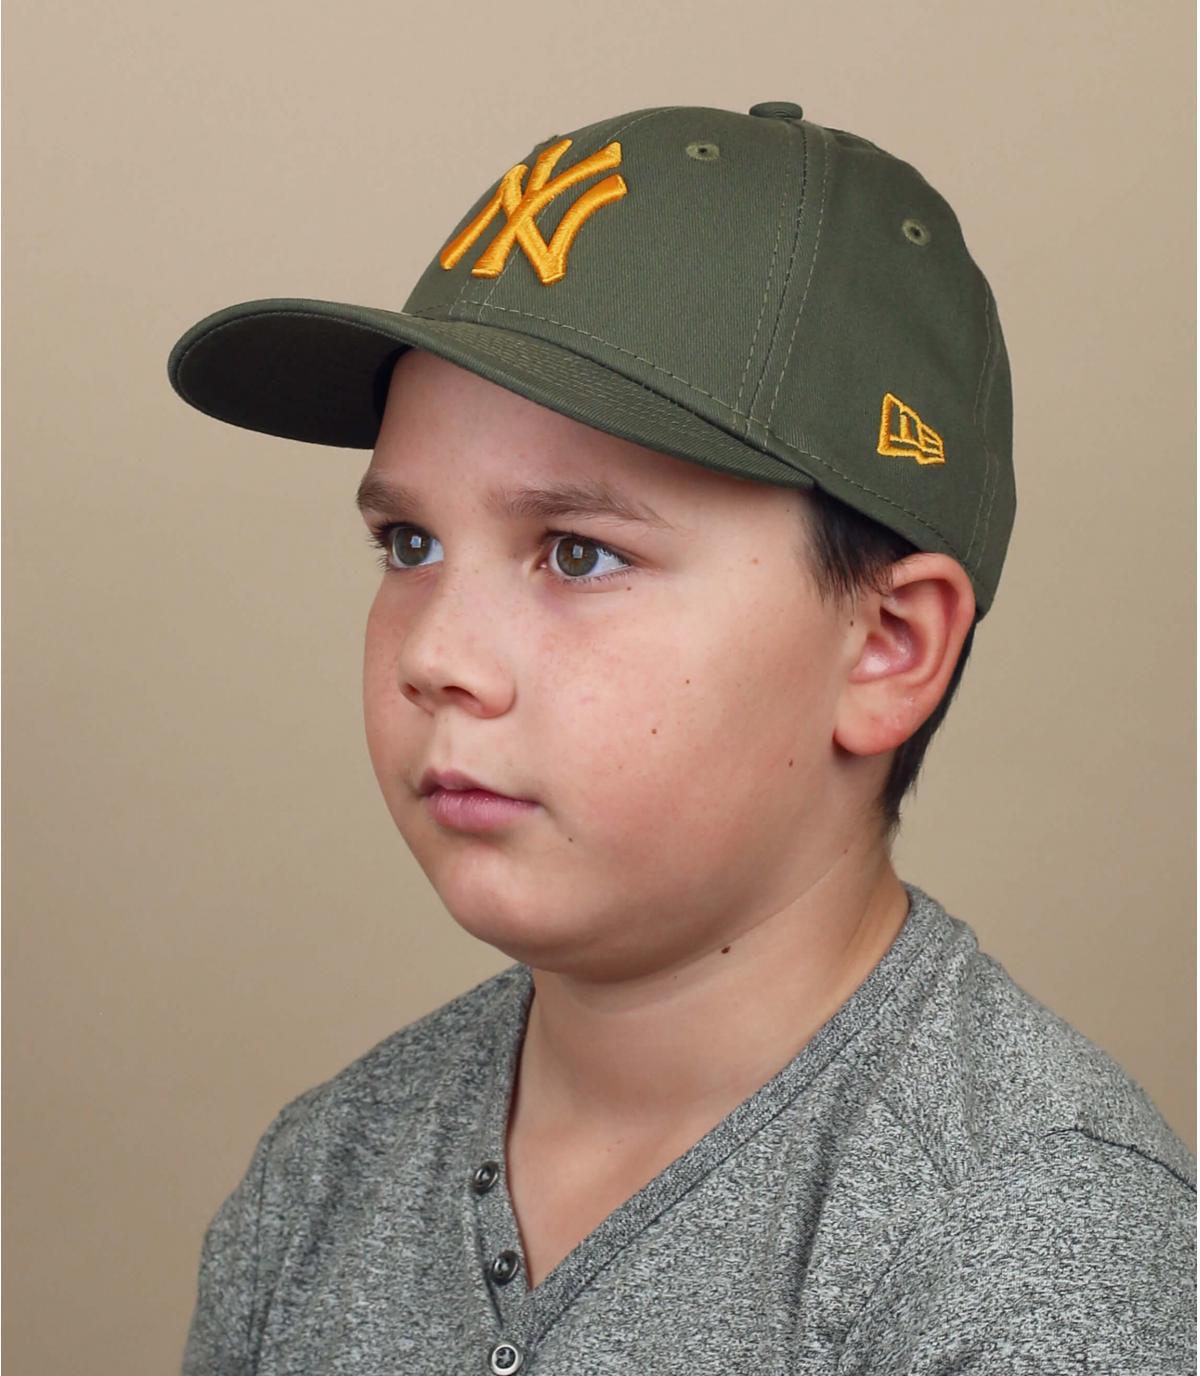 Cappellino da bambino giallo verde NY